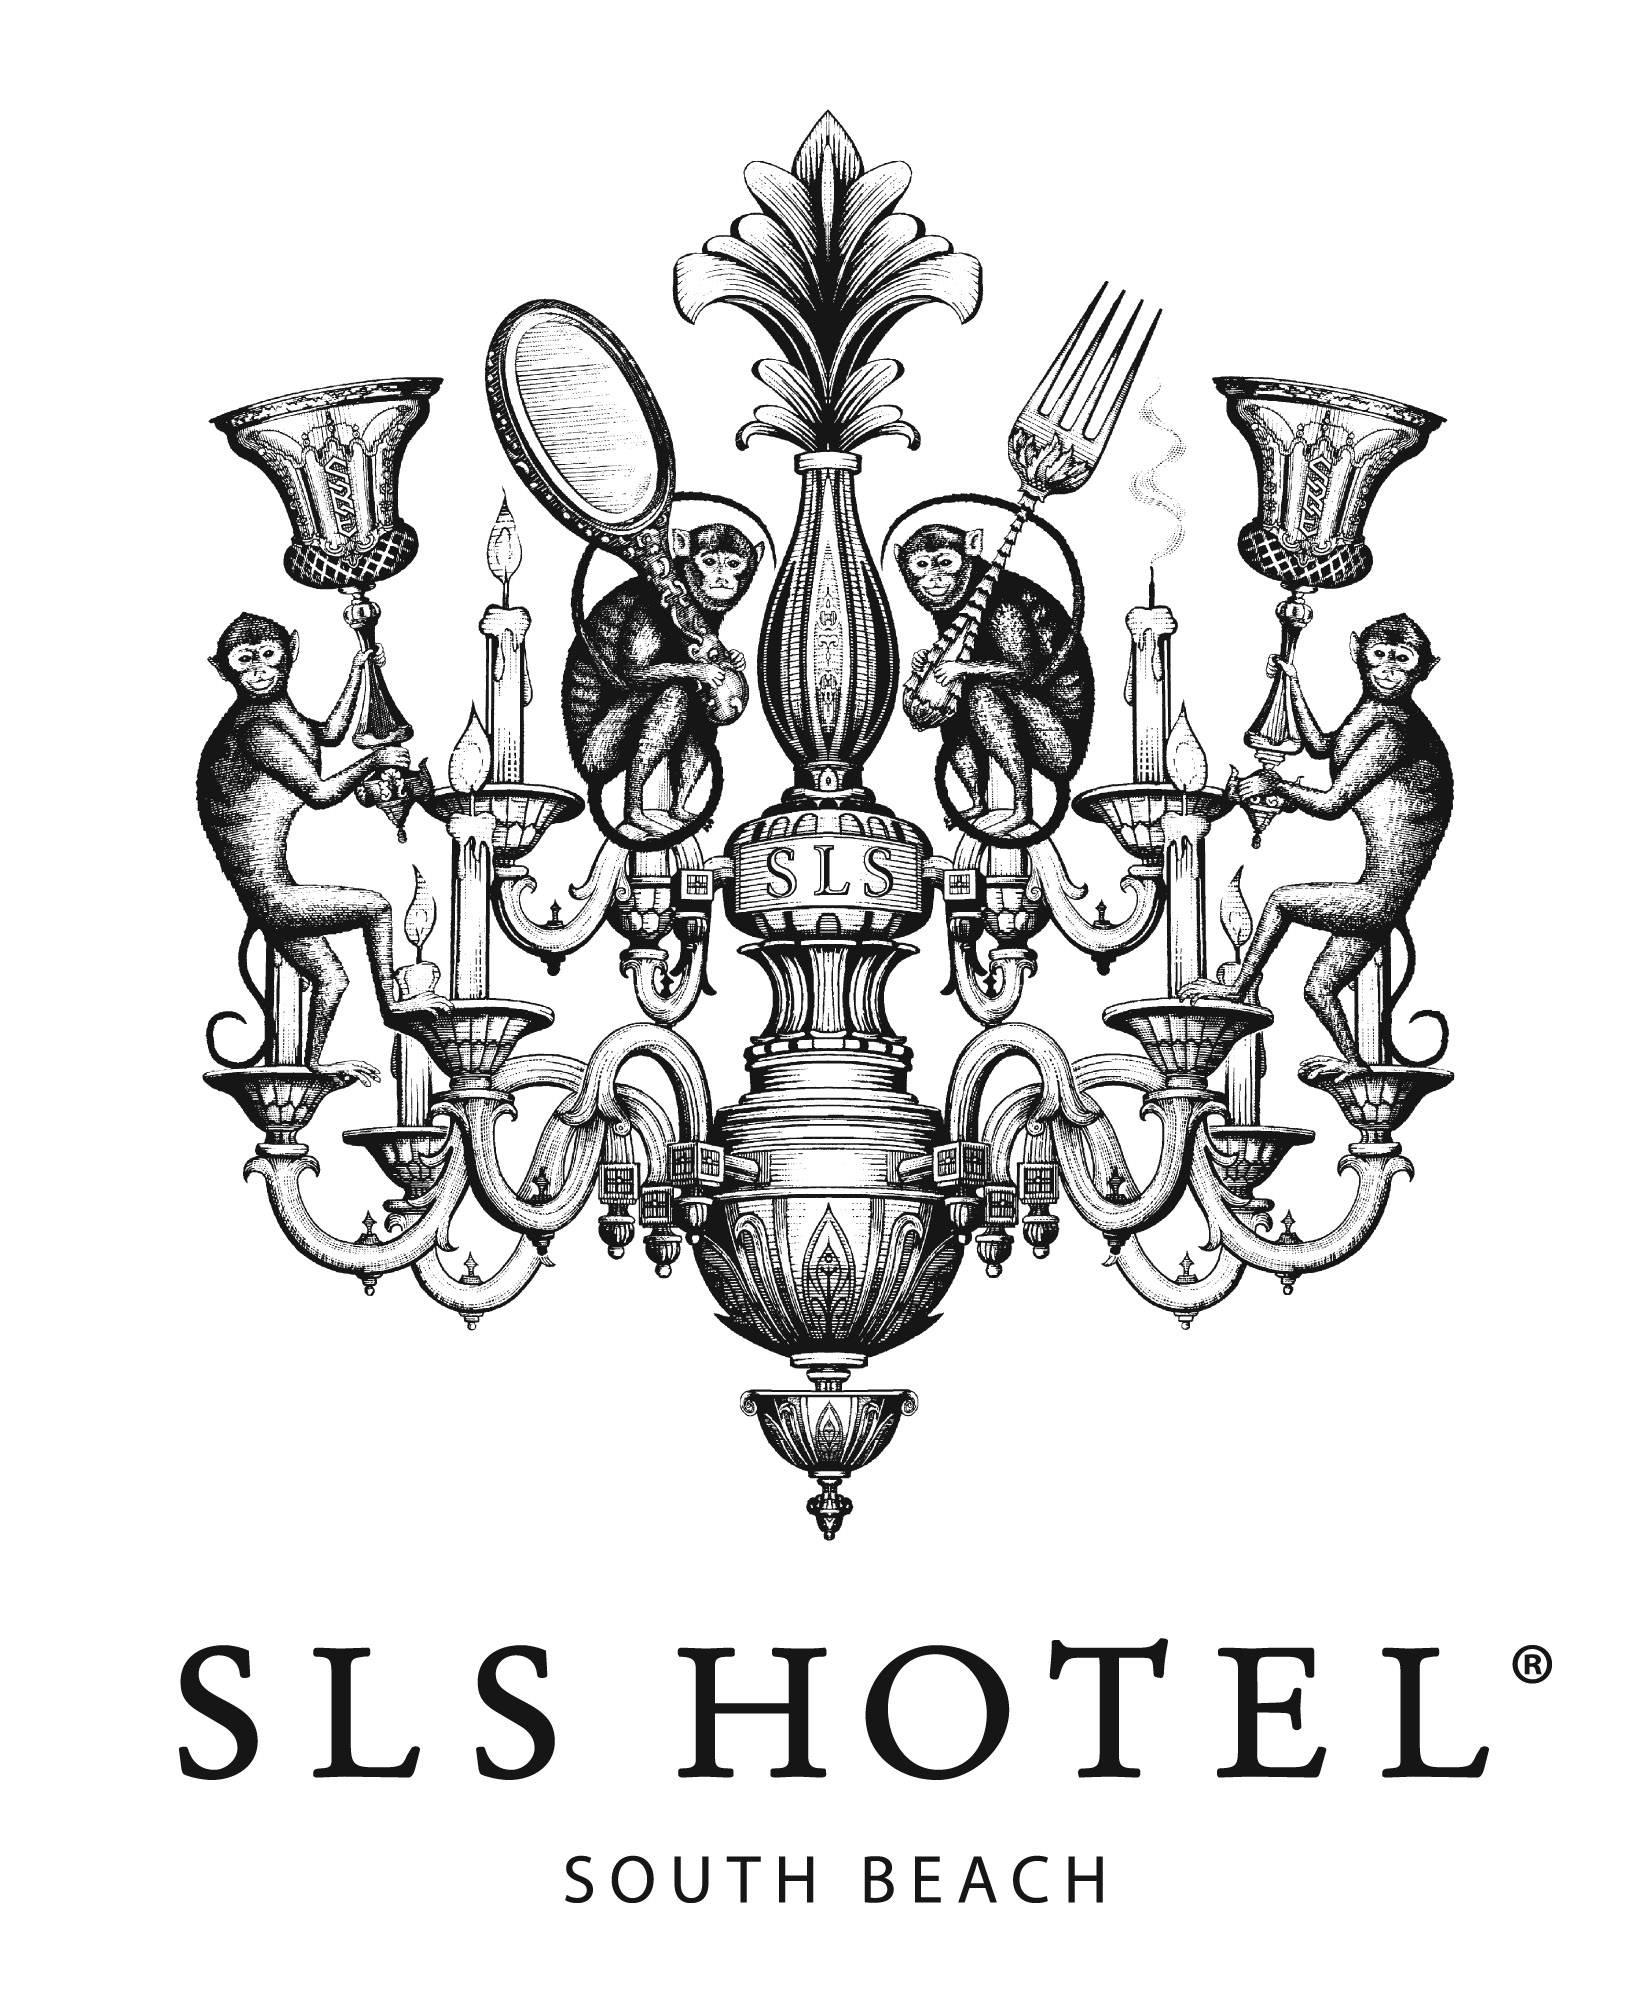 SLSCrest_SouthBeach